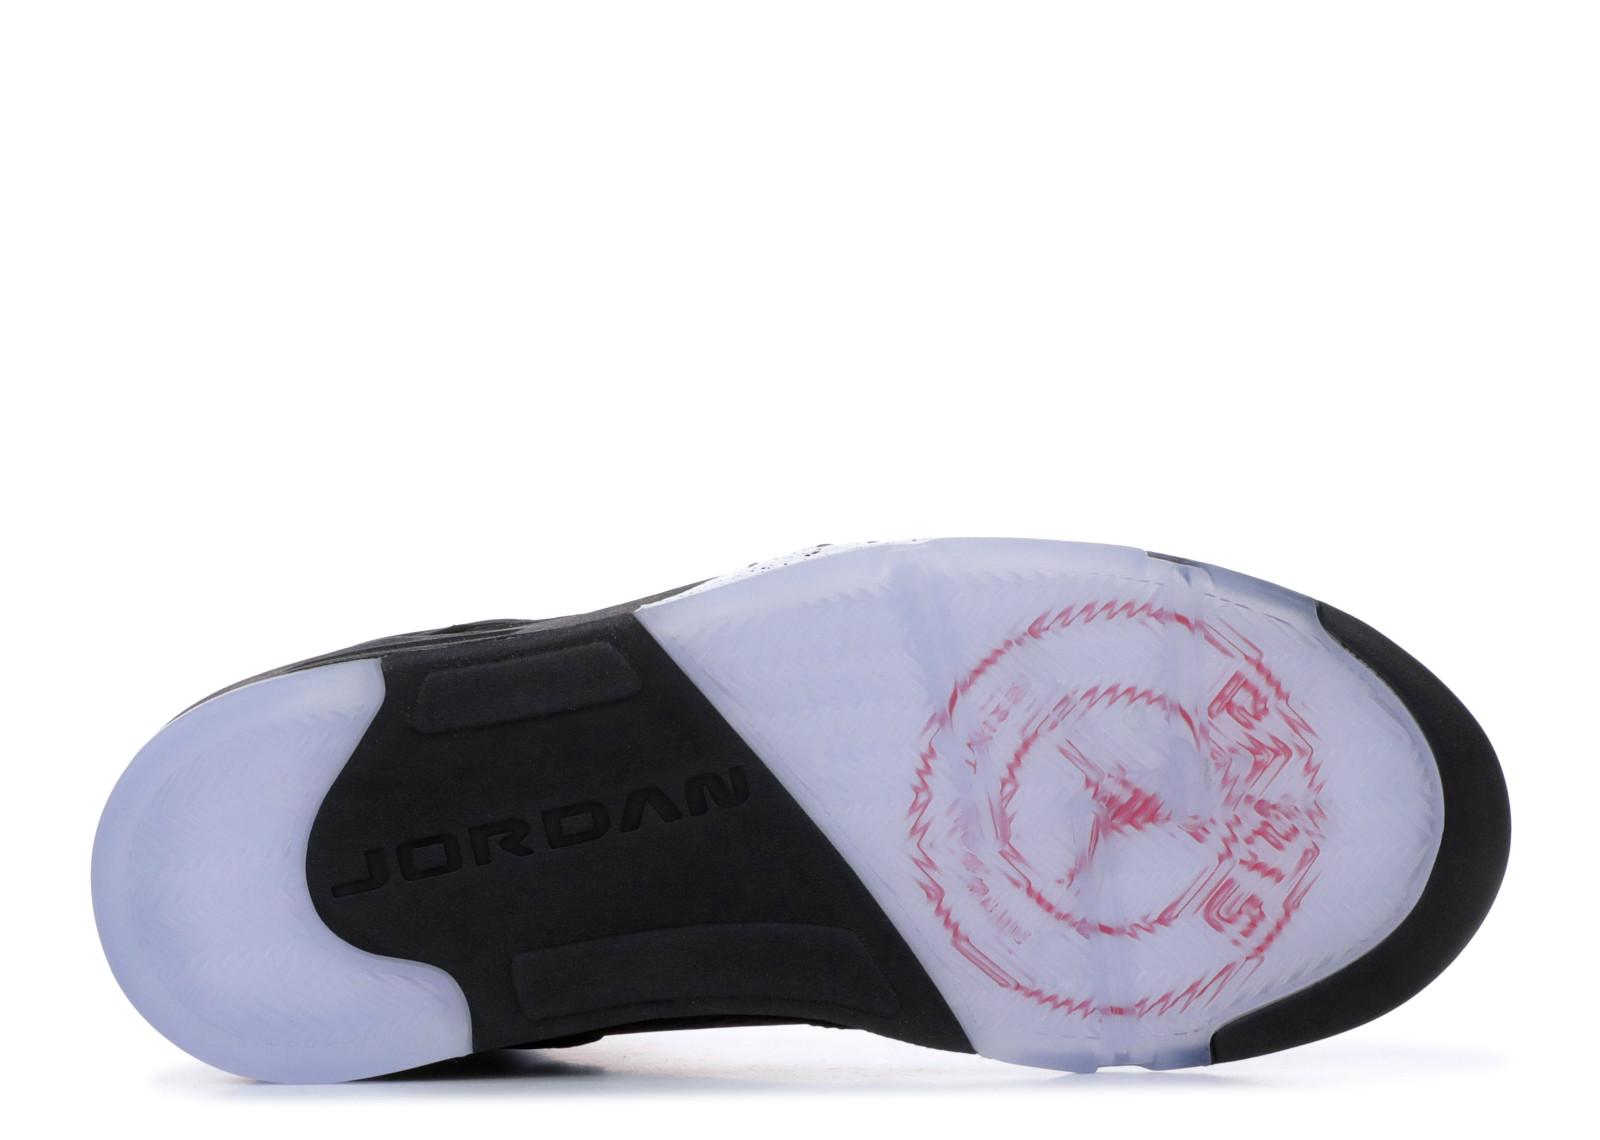 Air Jordan 5 Retro BCFC psg Paris Saint-Germain Black Challenge Red-White  AV9175-001